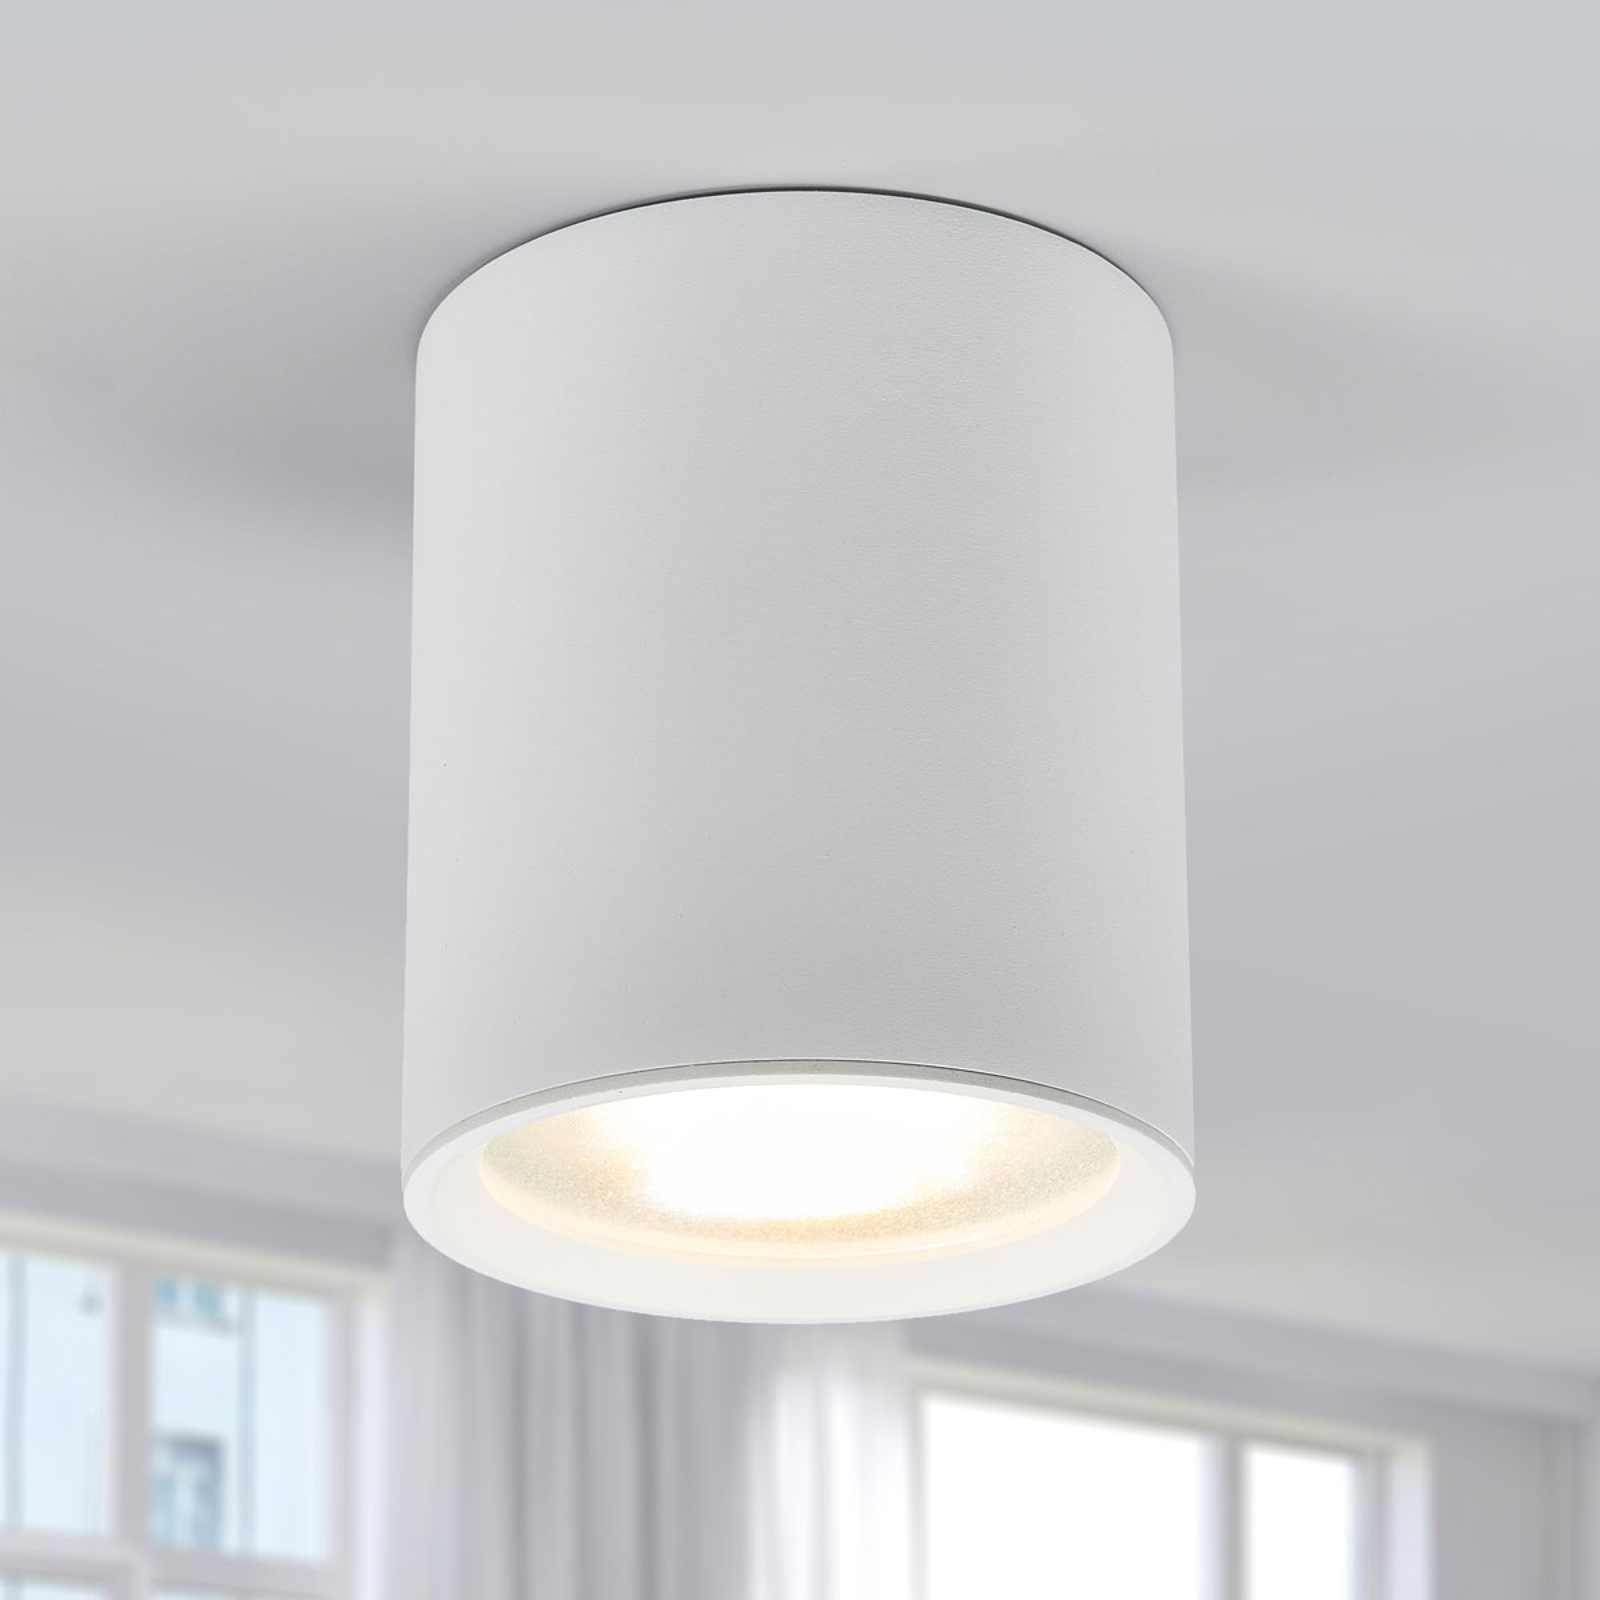 Lampa sufitowa LED Benk, 13 cm, 12,3 W